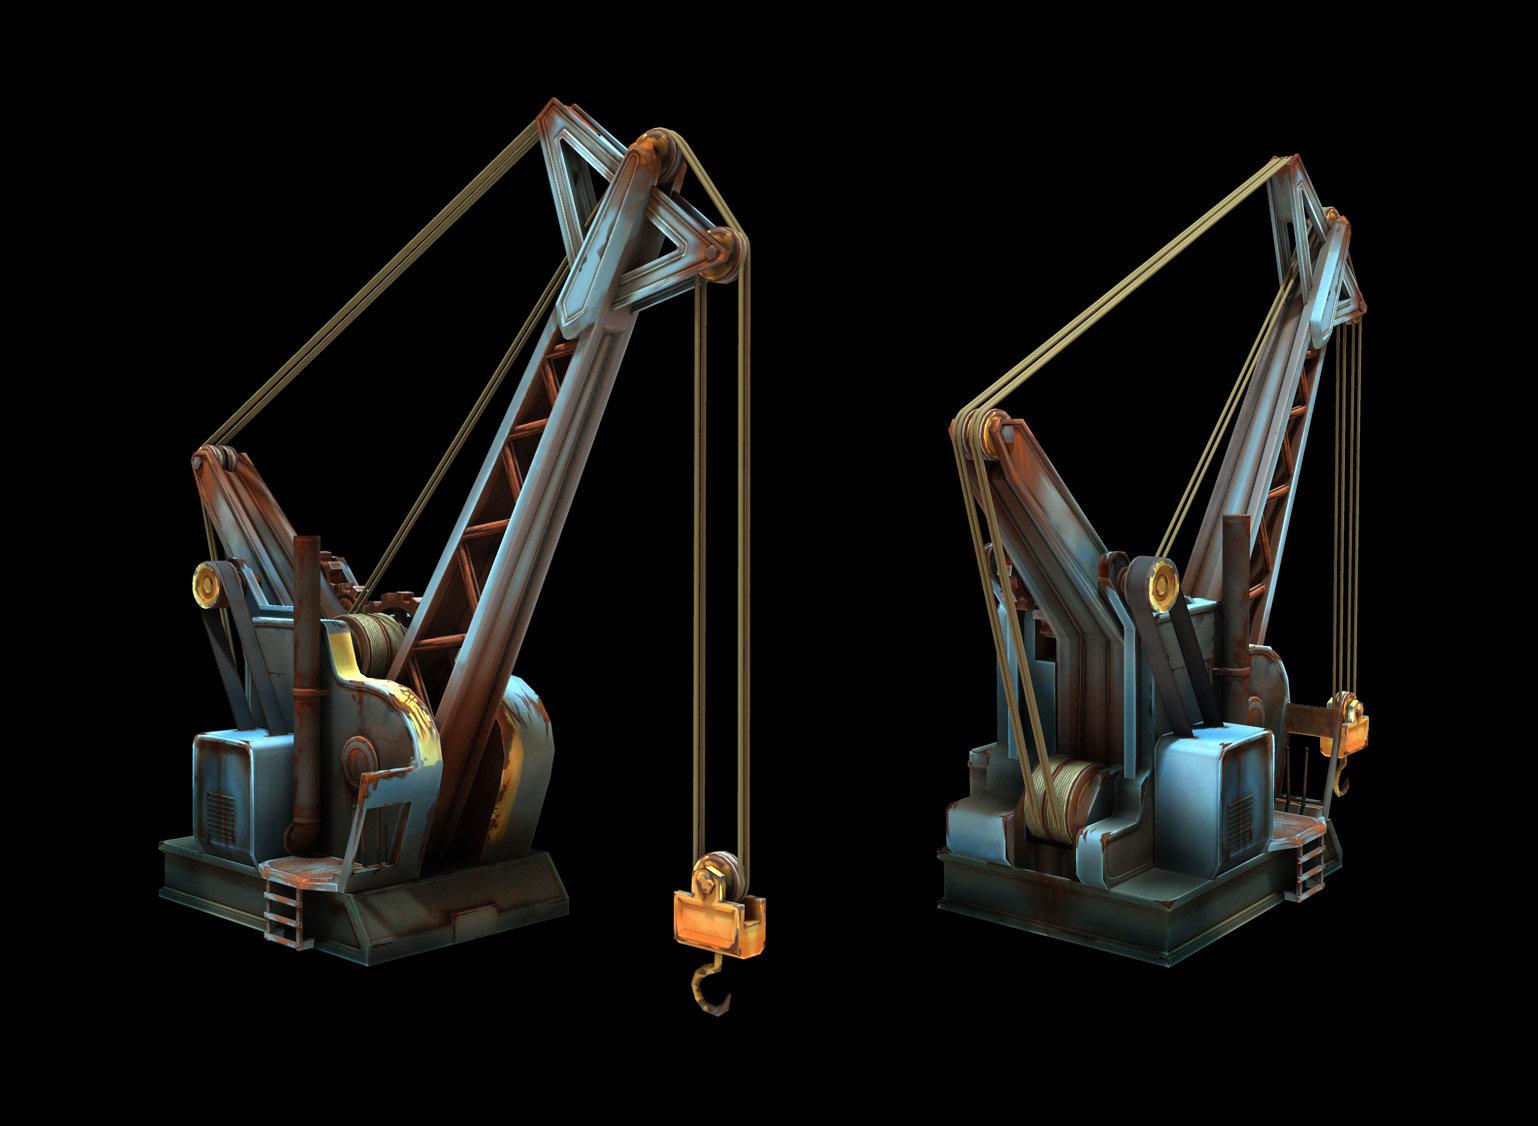 Crane model by Benjamin Sauder and Johannes Figlhuber, Concept by Julius Brockelmann